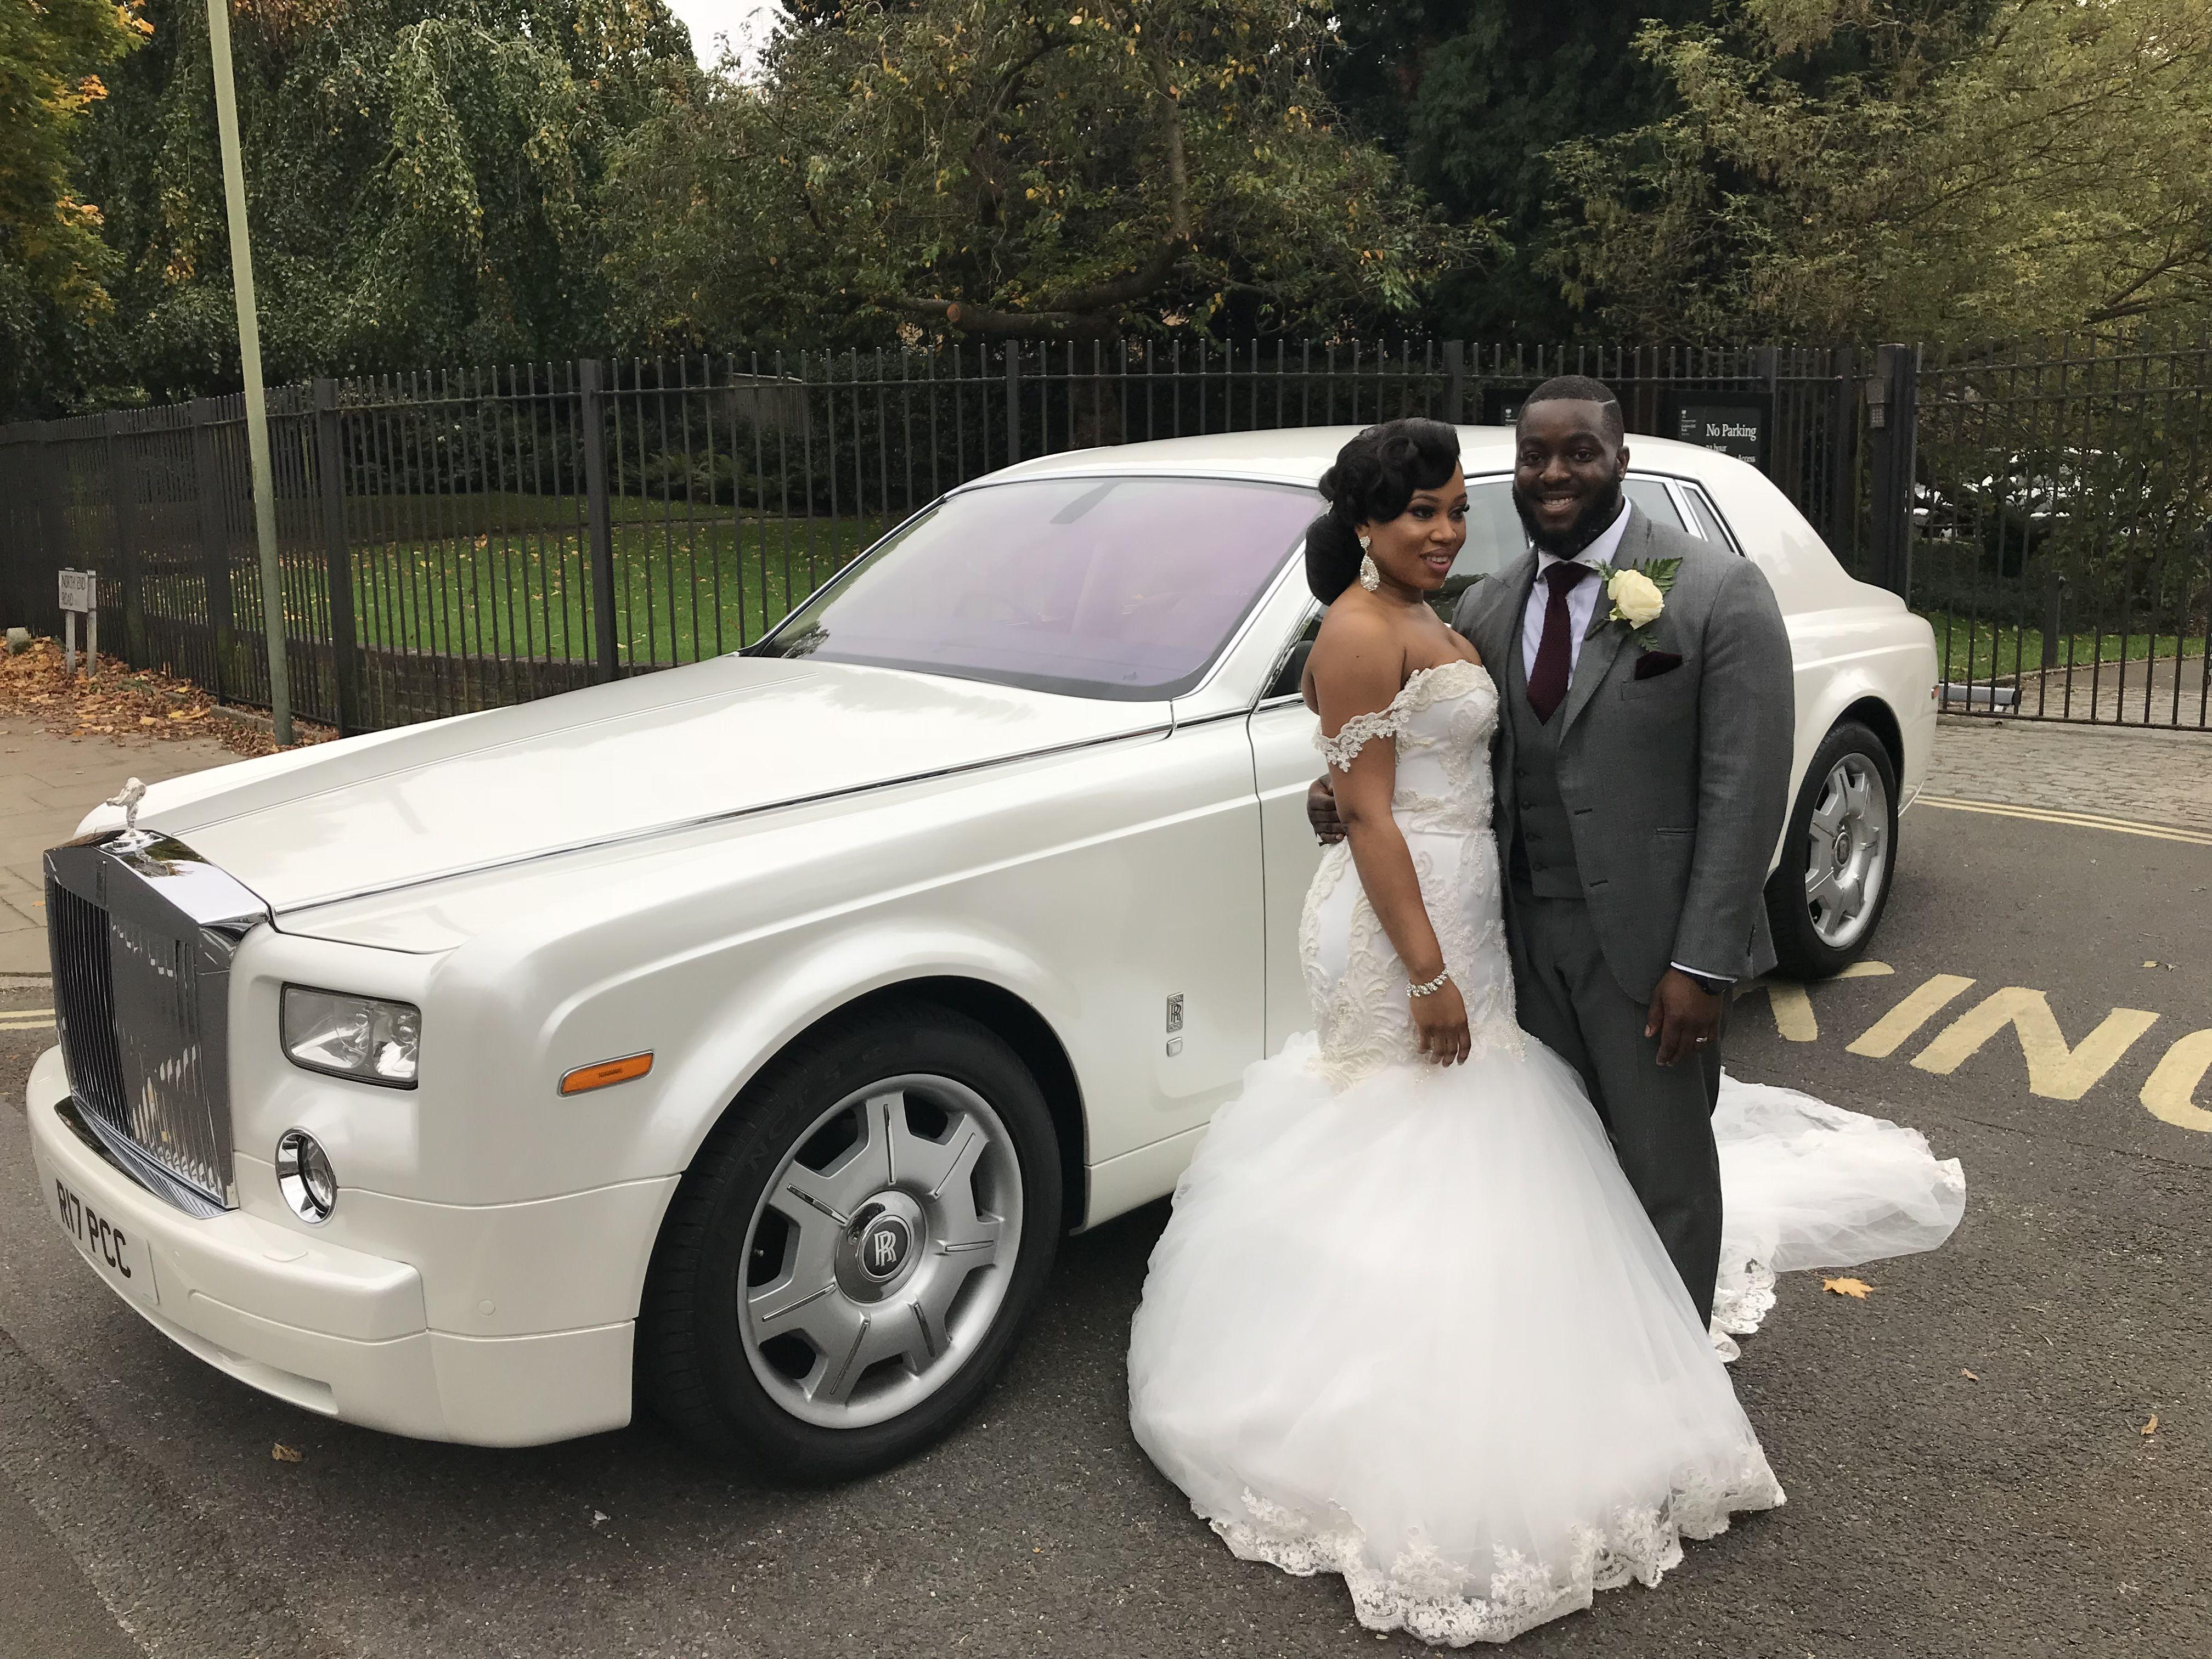 Chauffeur Hire Private Jet Charter Car Hire Wedding Hire Luxury Car Hire Wedding Car Hire